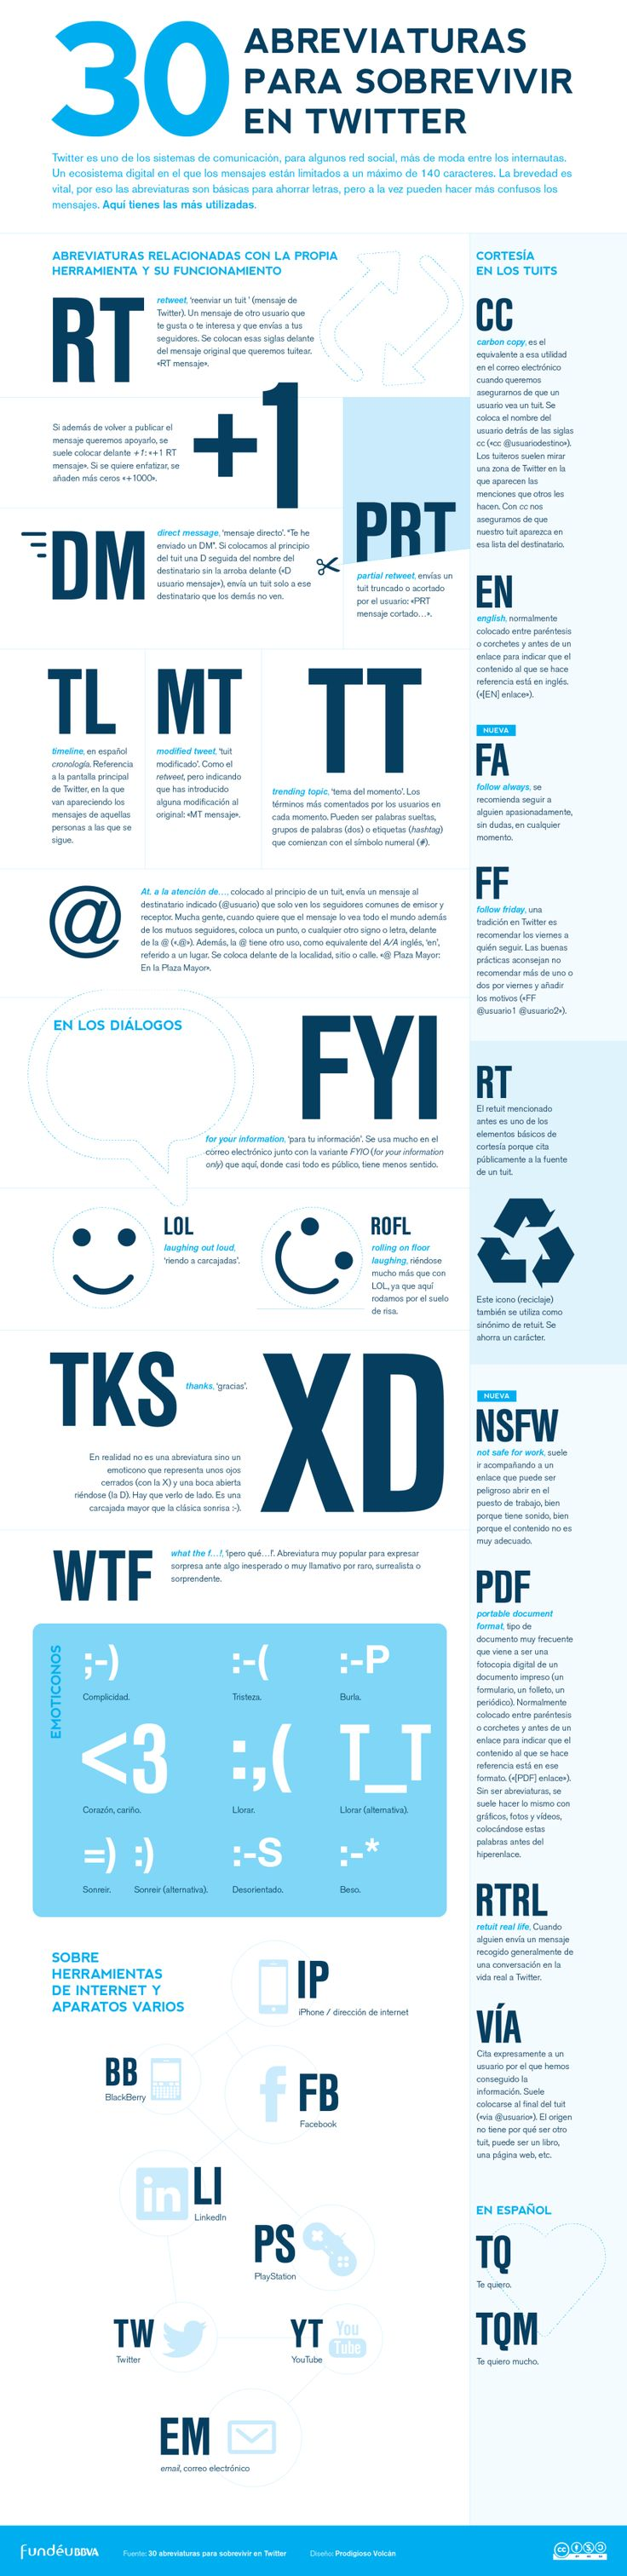 30 abreviaturas para sobrevivir en Twitter #infografia